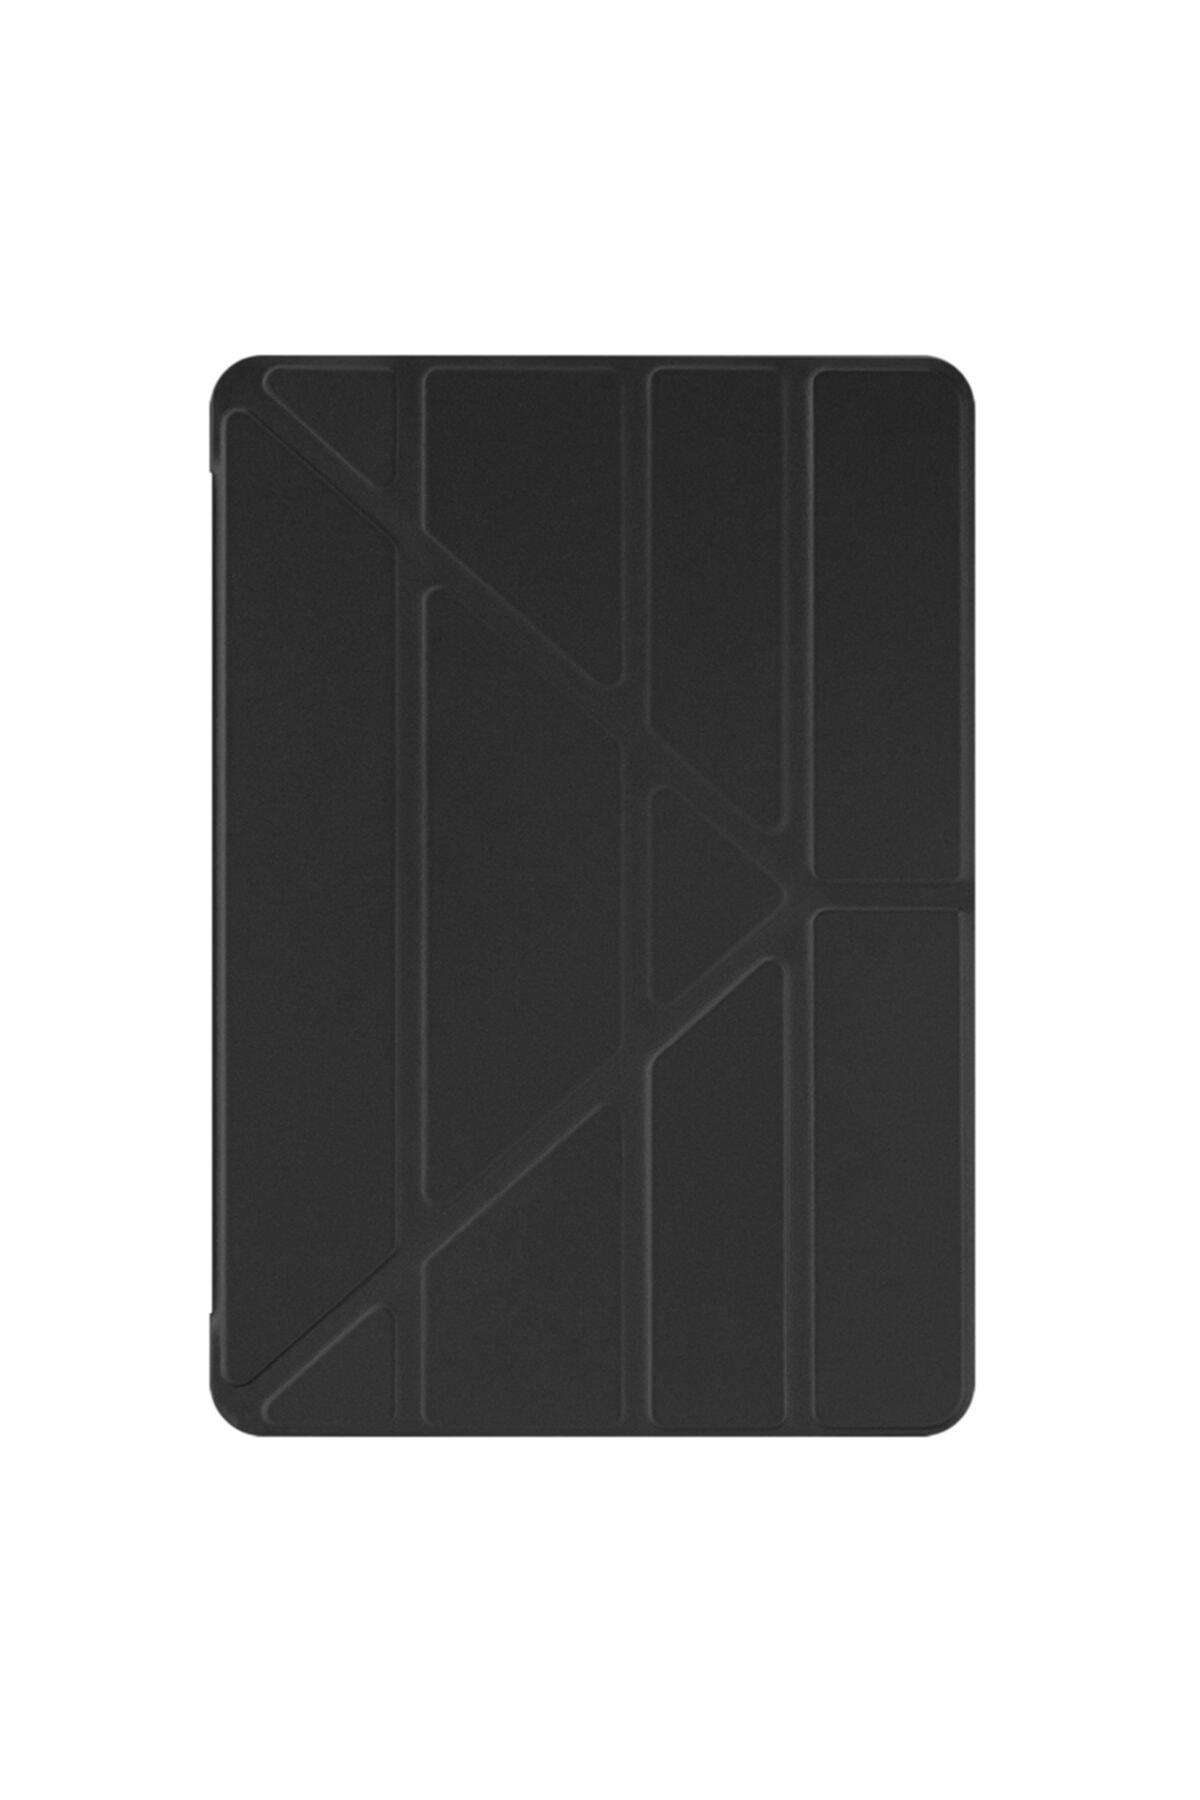 "Samsung Microsonic Galaxy Tab S6 Lite 10.4"" P610 Kılıf Origami Pencil Siyah 2"